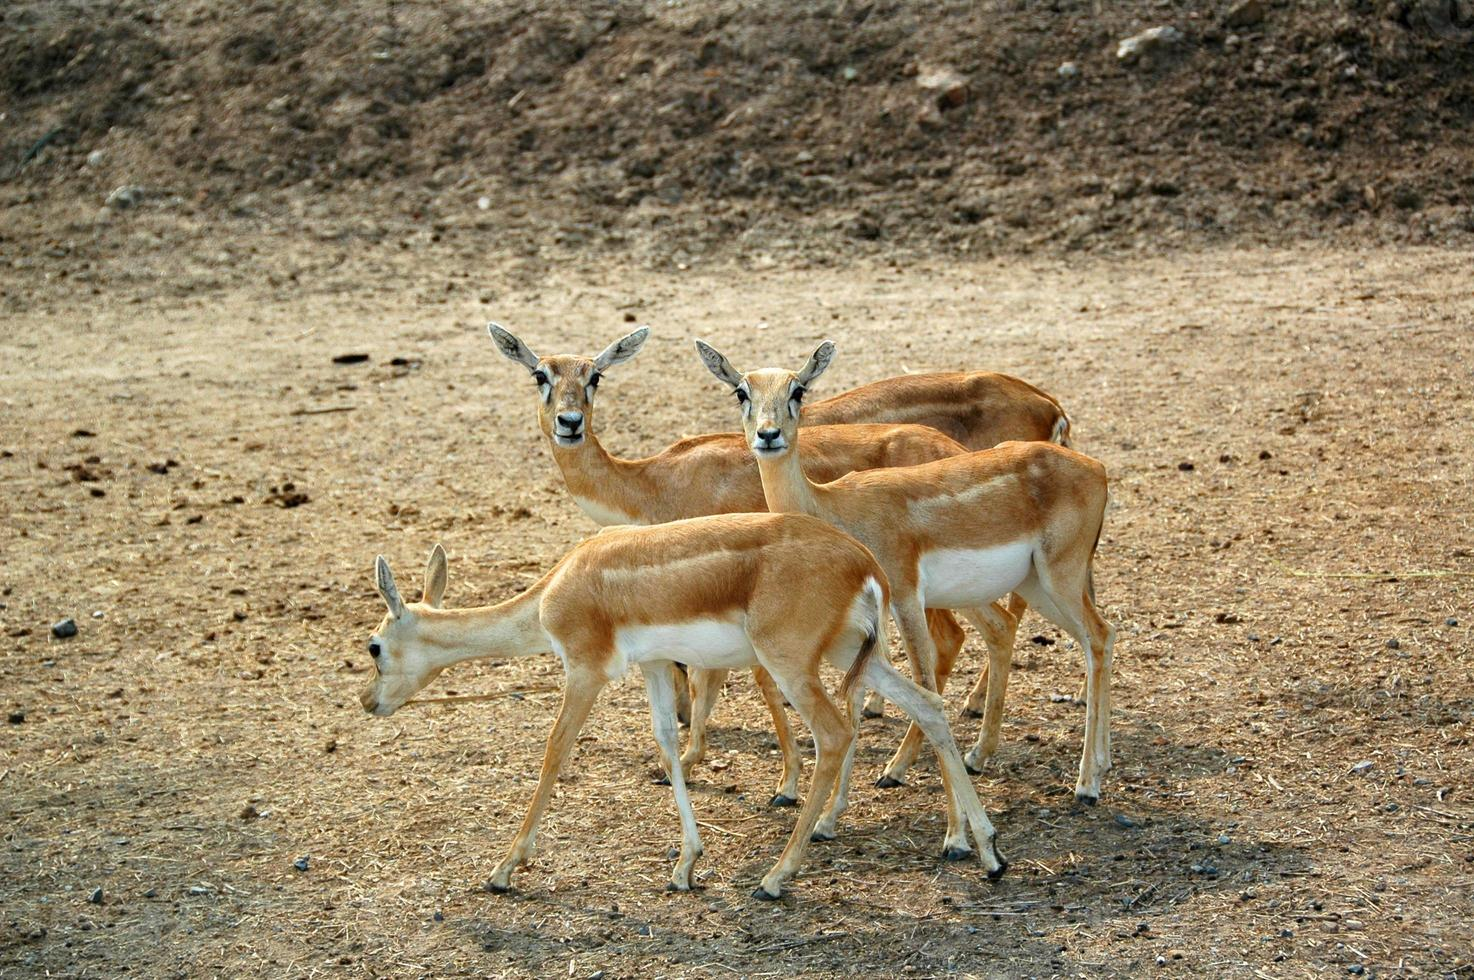 Goitered Gazelle (Gazella subgutturosa) photo